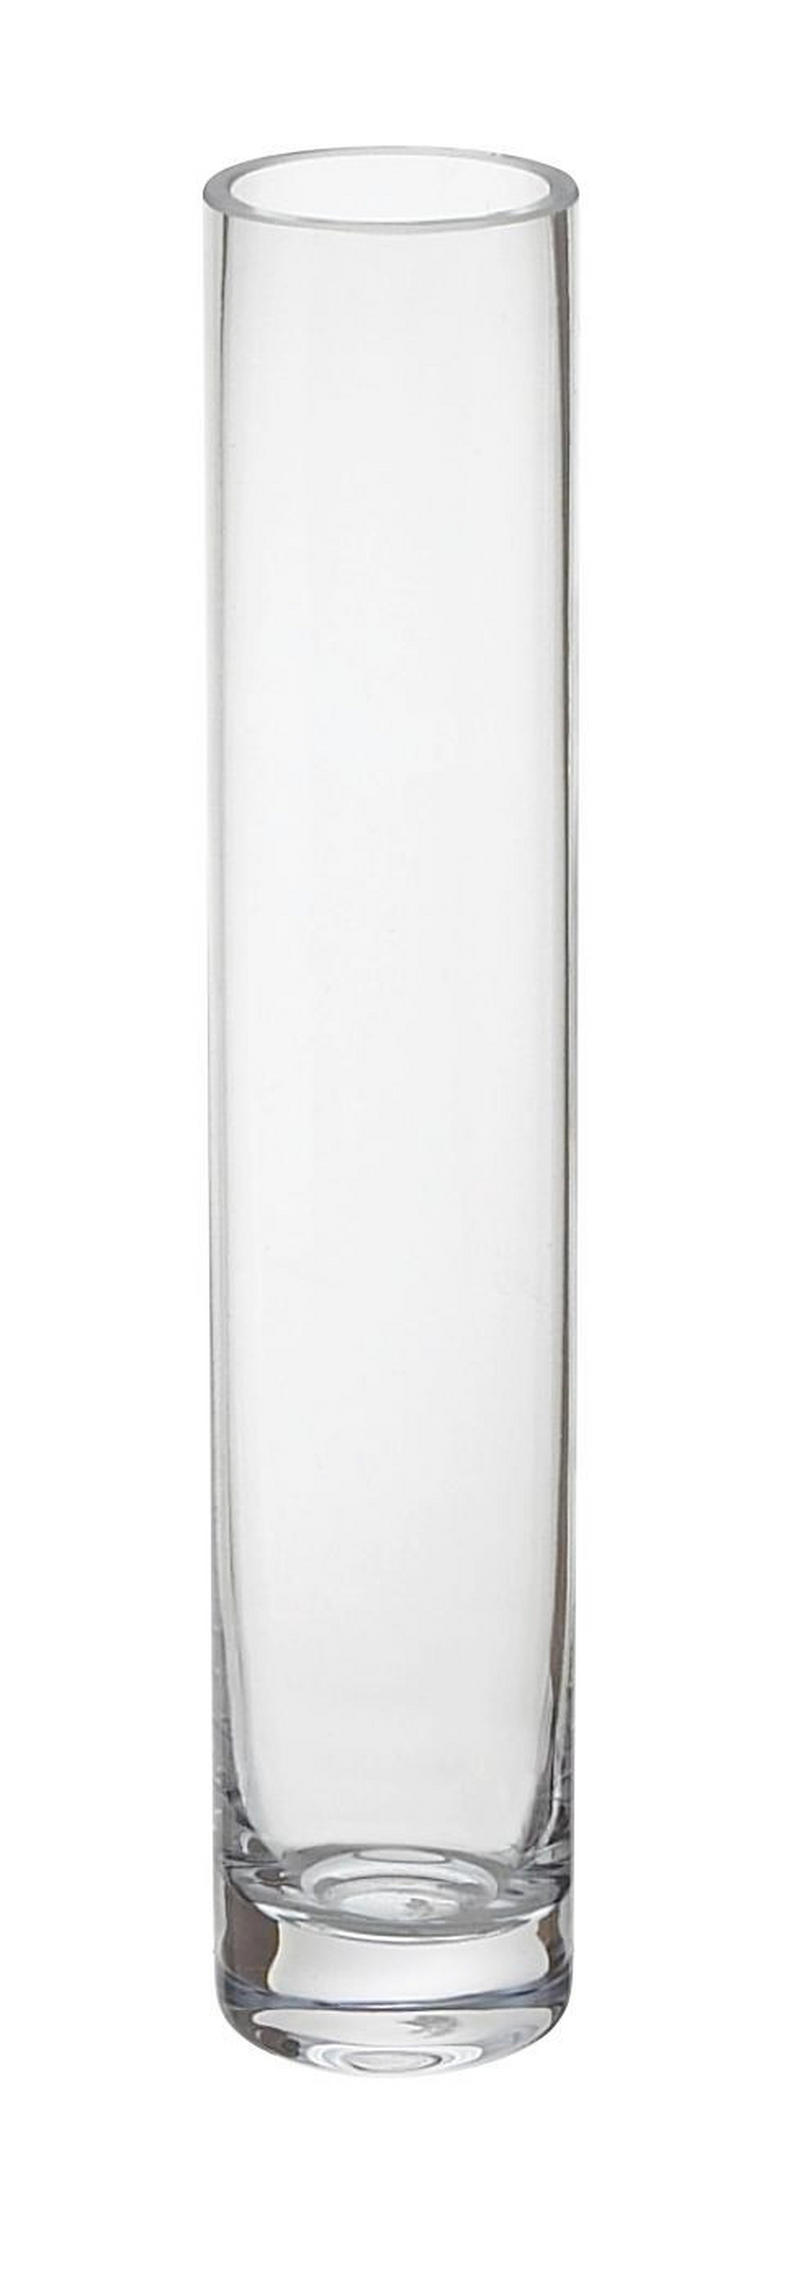 VAS - klar, Basics, glas (5/25cm) - Ambia Home